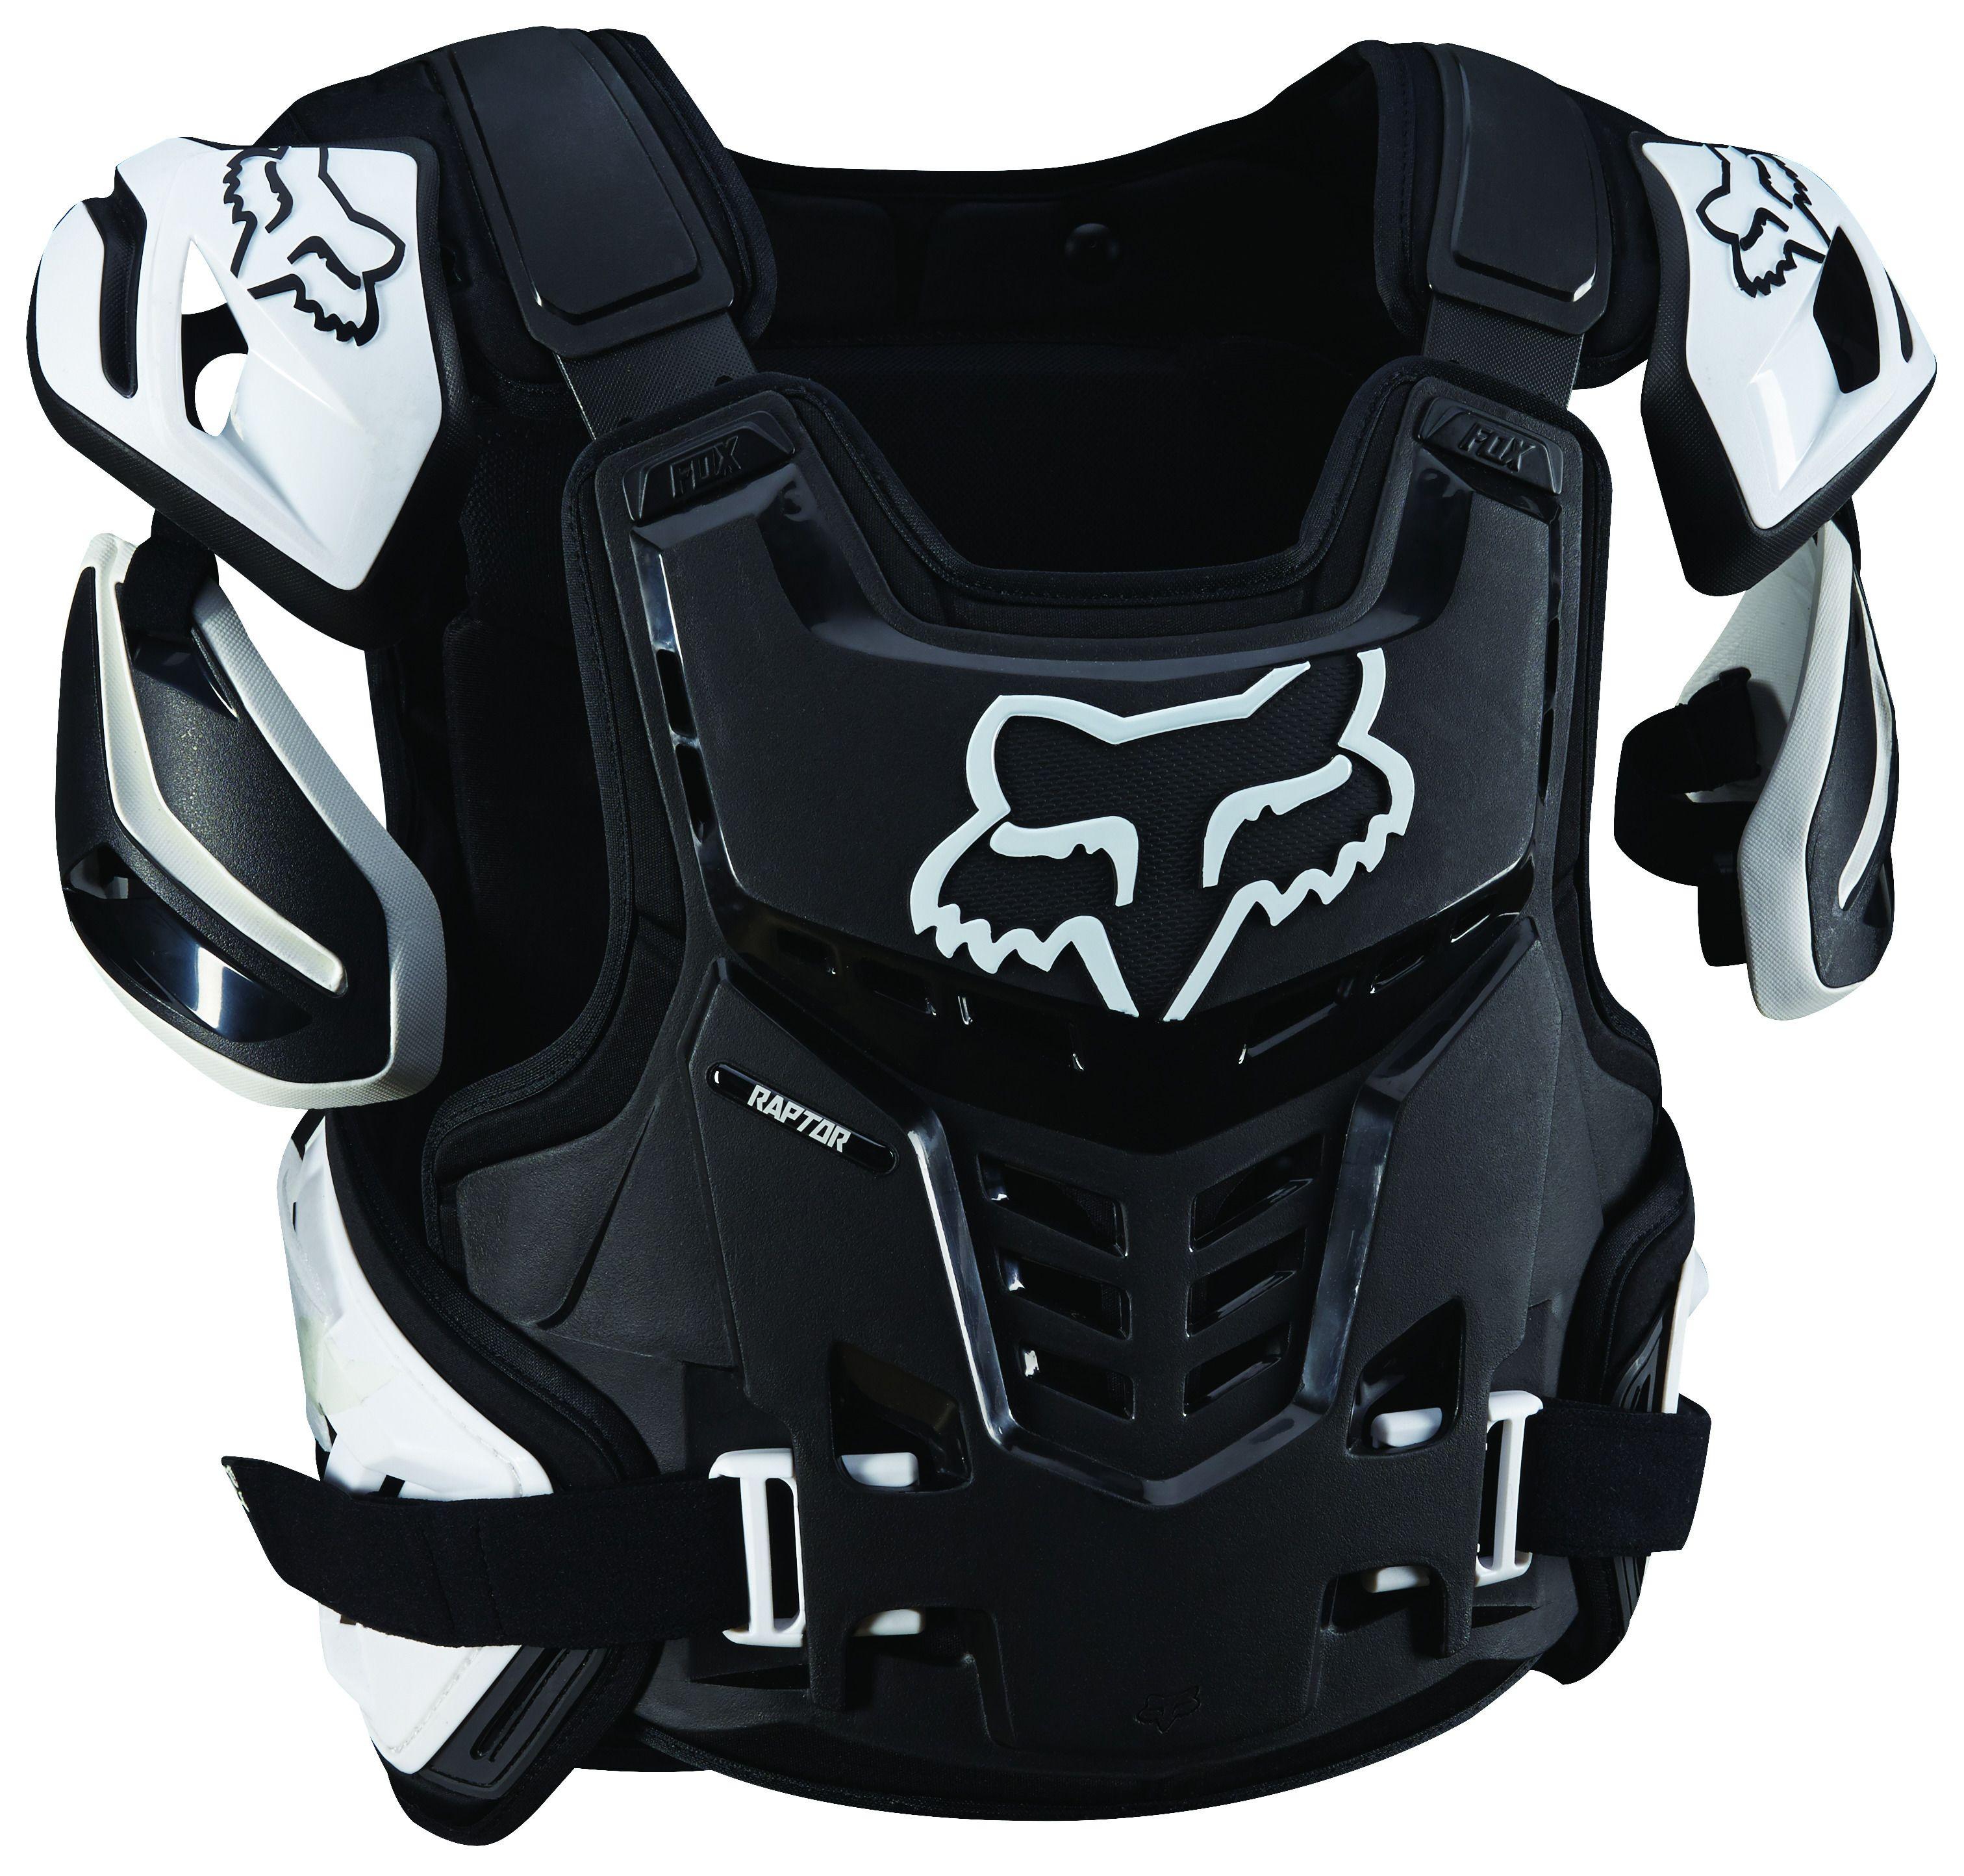 fox racing r3 roost deflector cycle gear. Black Bedroom Furniture Sets. Home Design Ideas